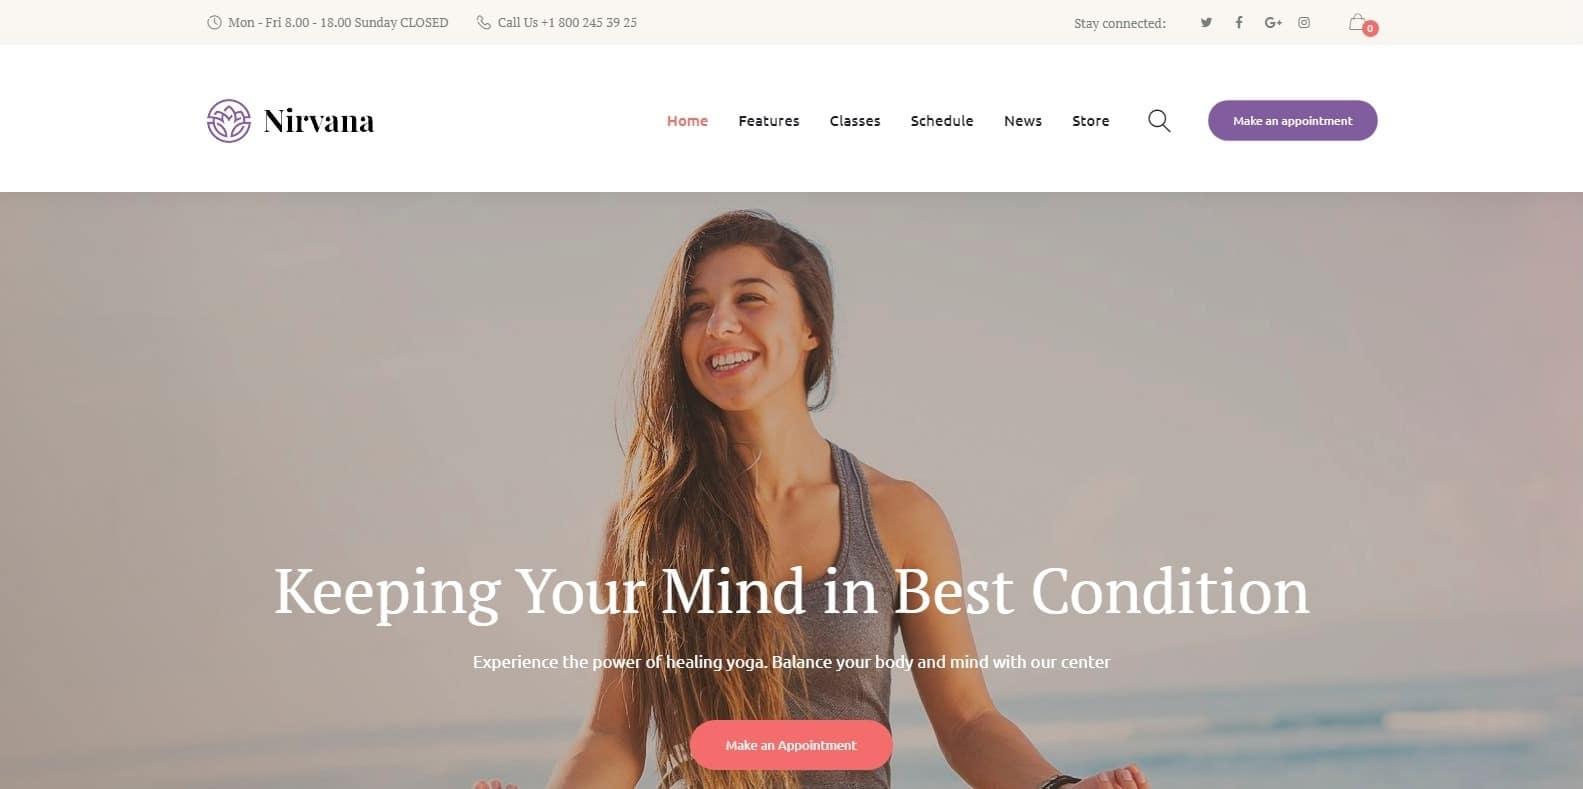 nirvana-sports-website-template